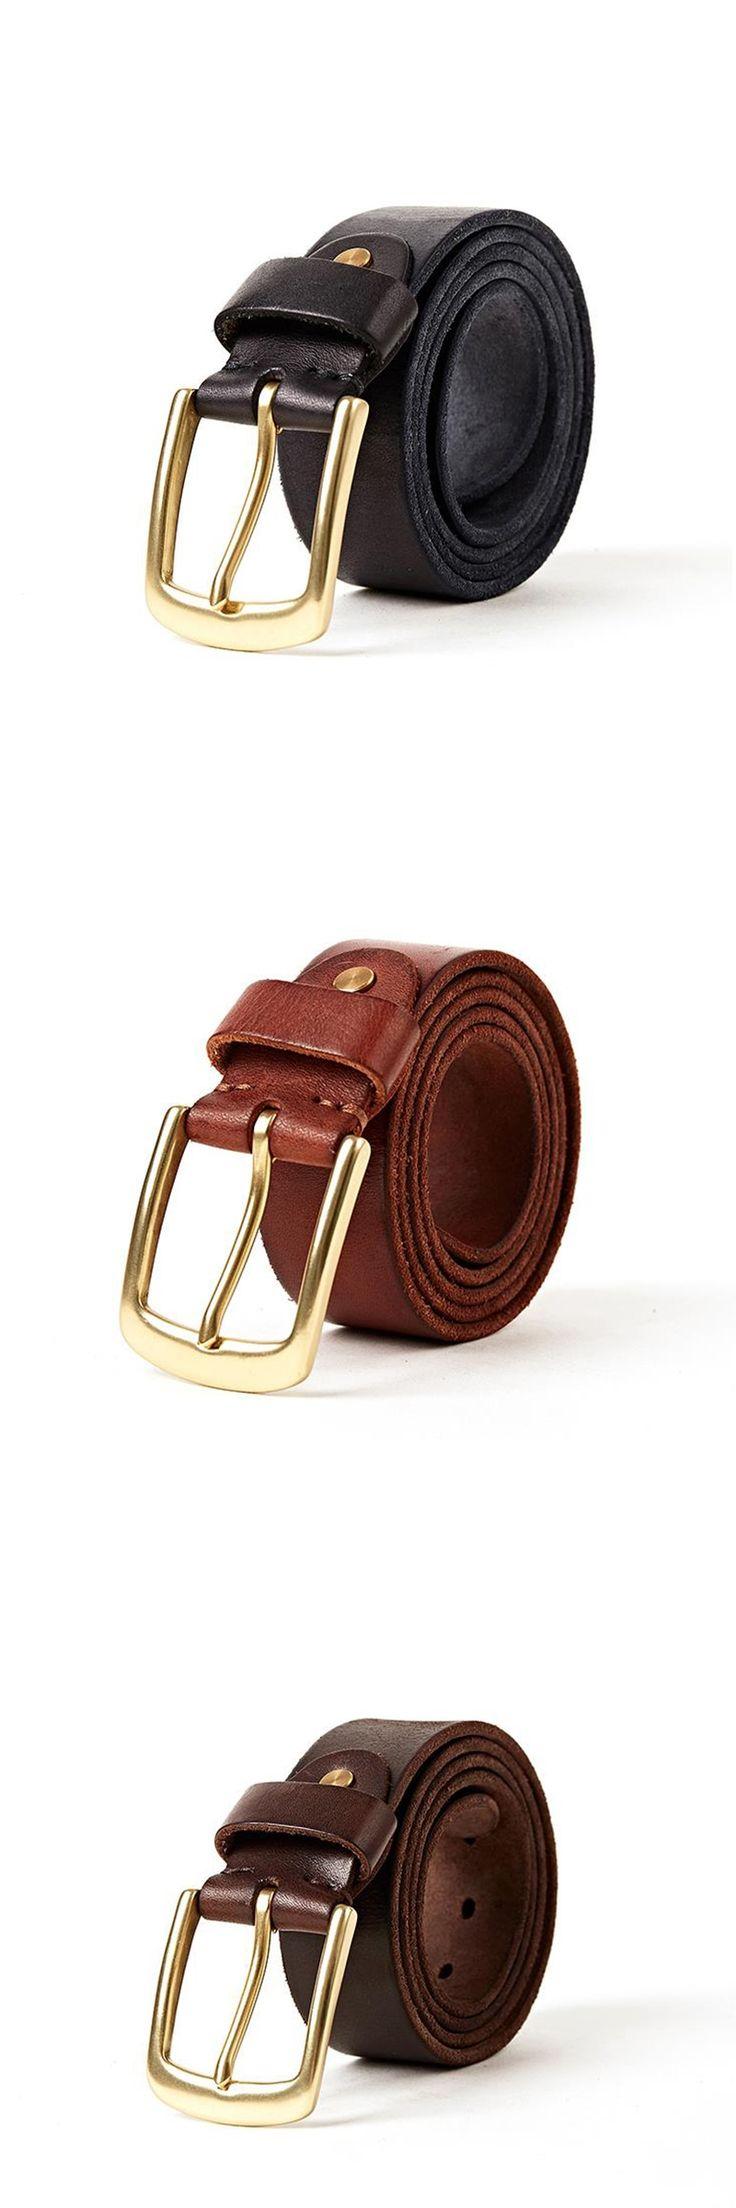 Vintage leather belt men metrosexual man pure copper buckle belt width pure head layer cowhide belt